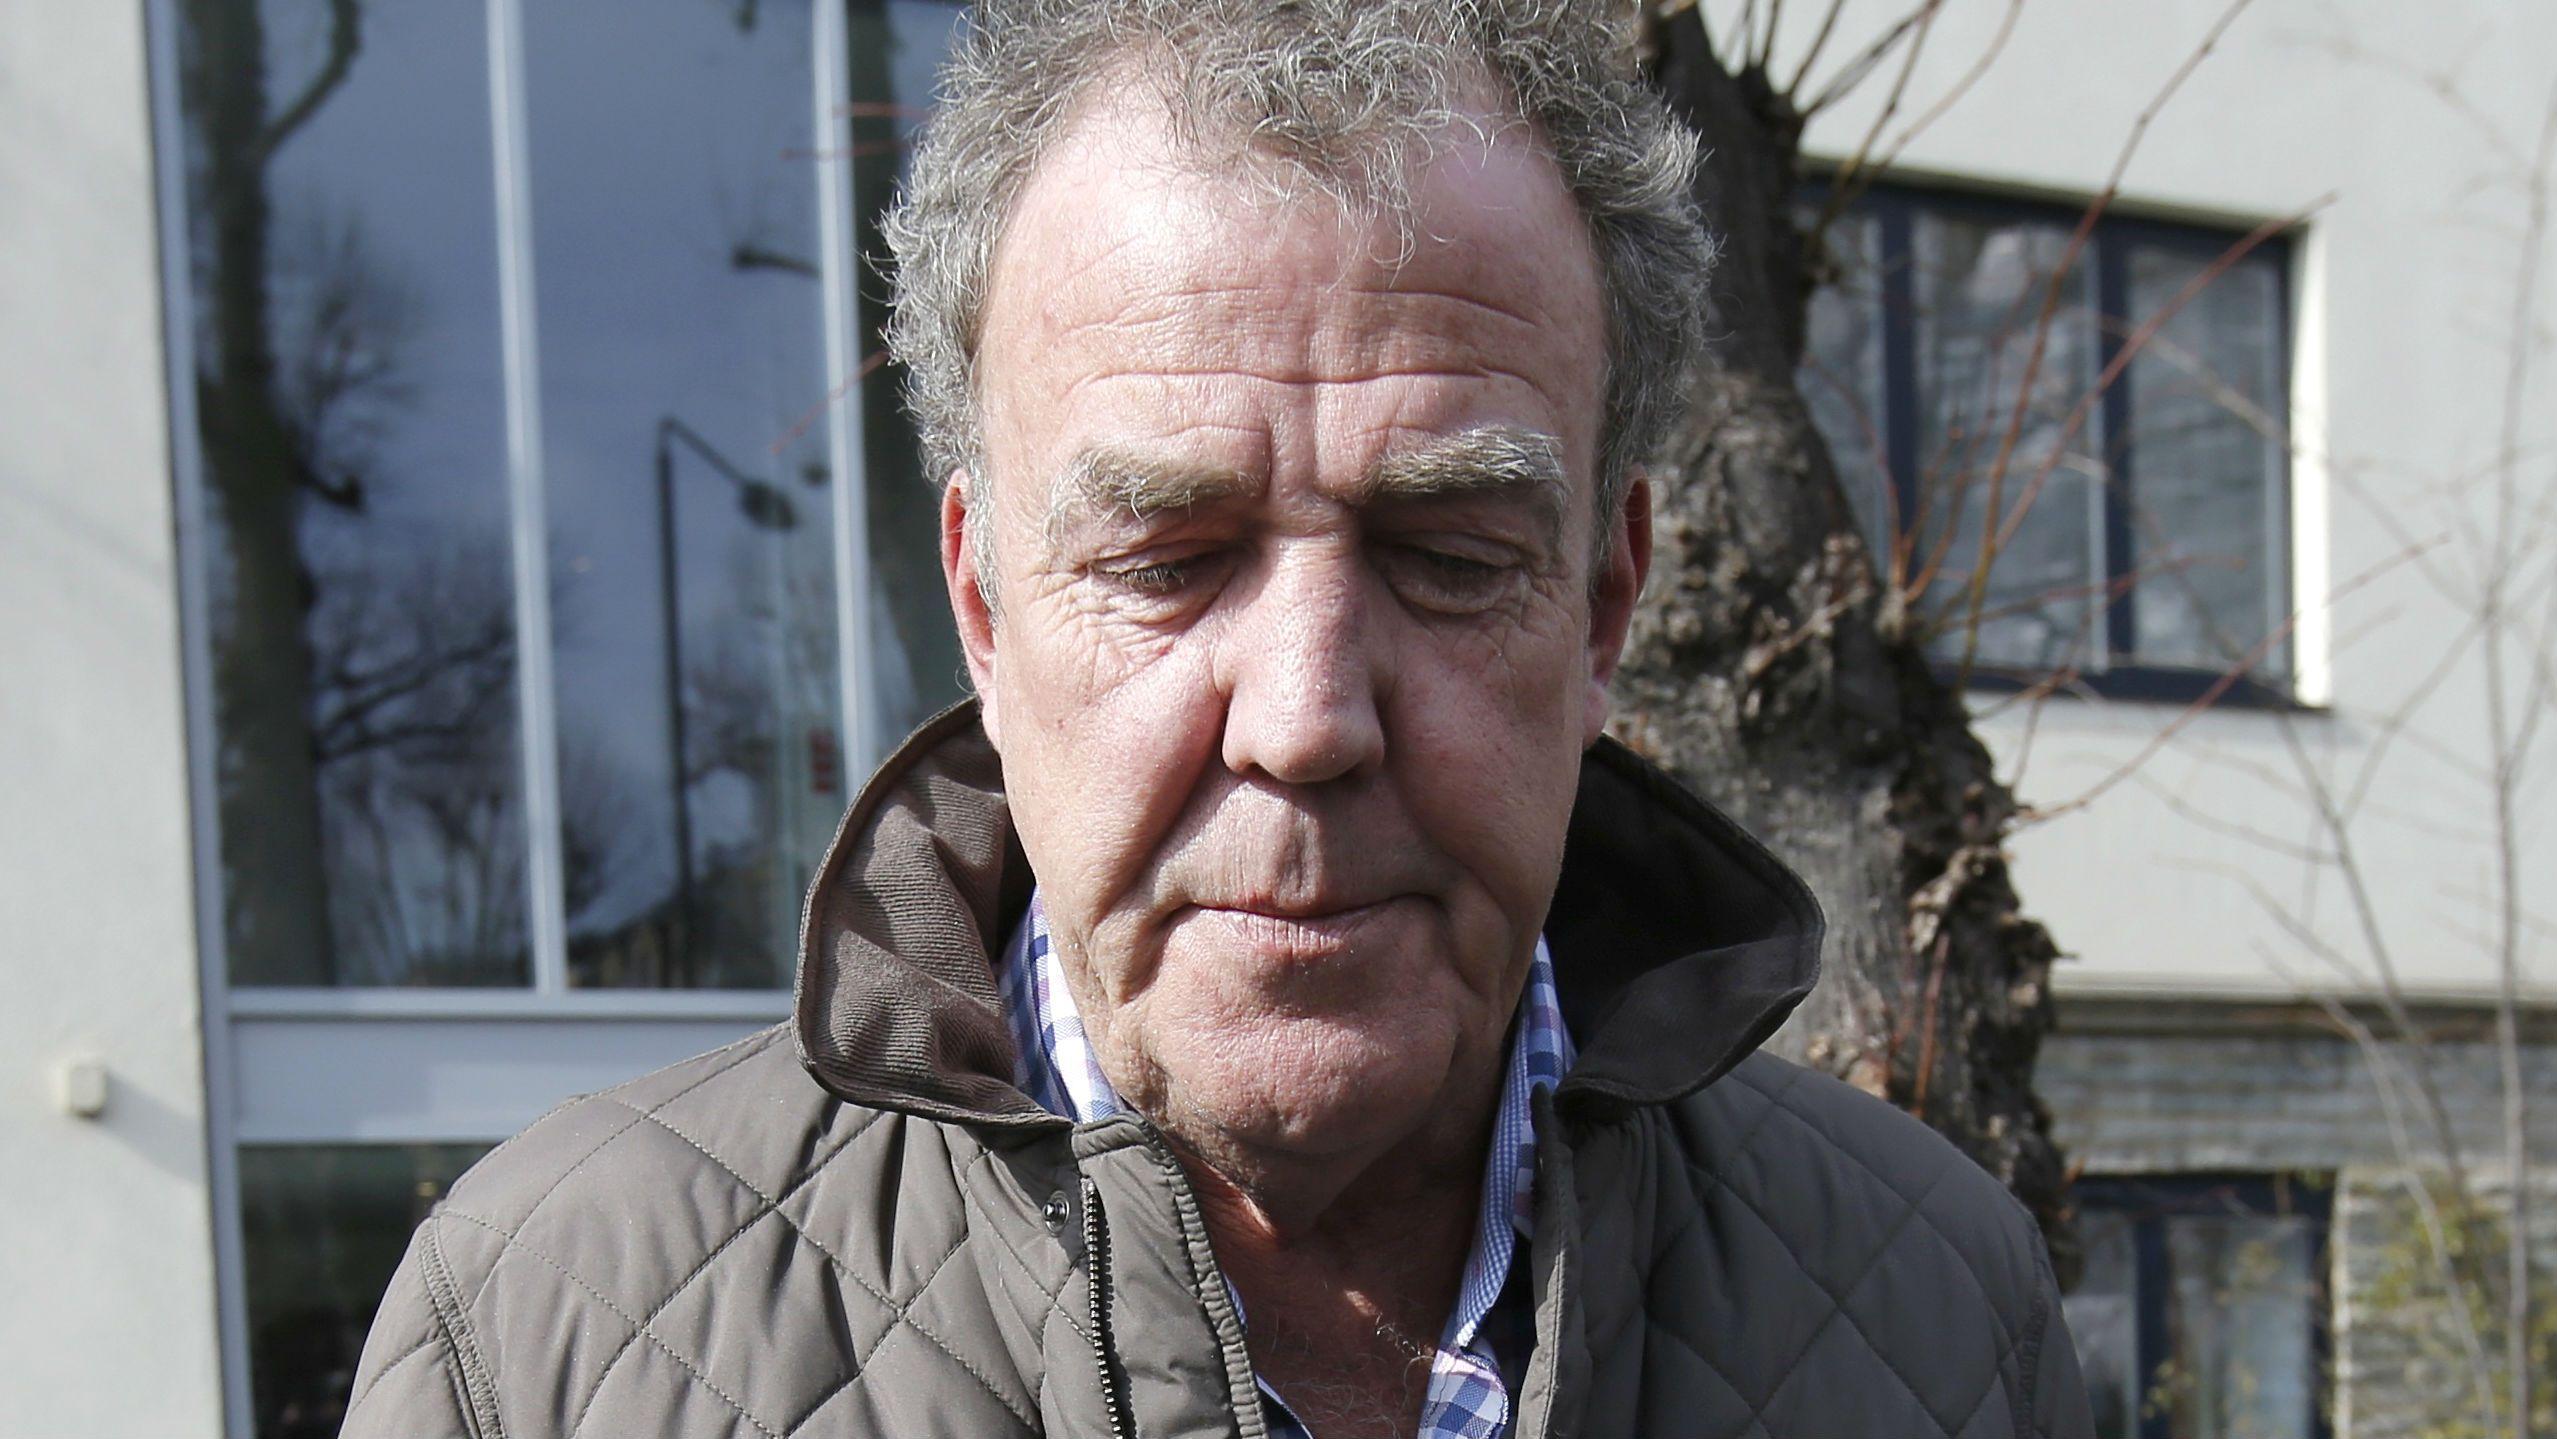 Jeremy Clarkson BBC Top Gear